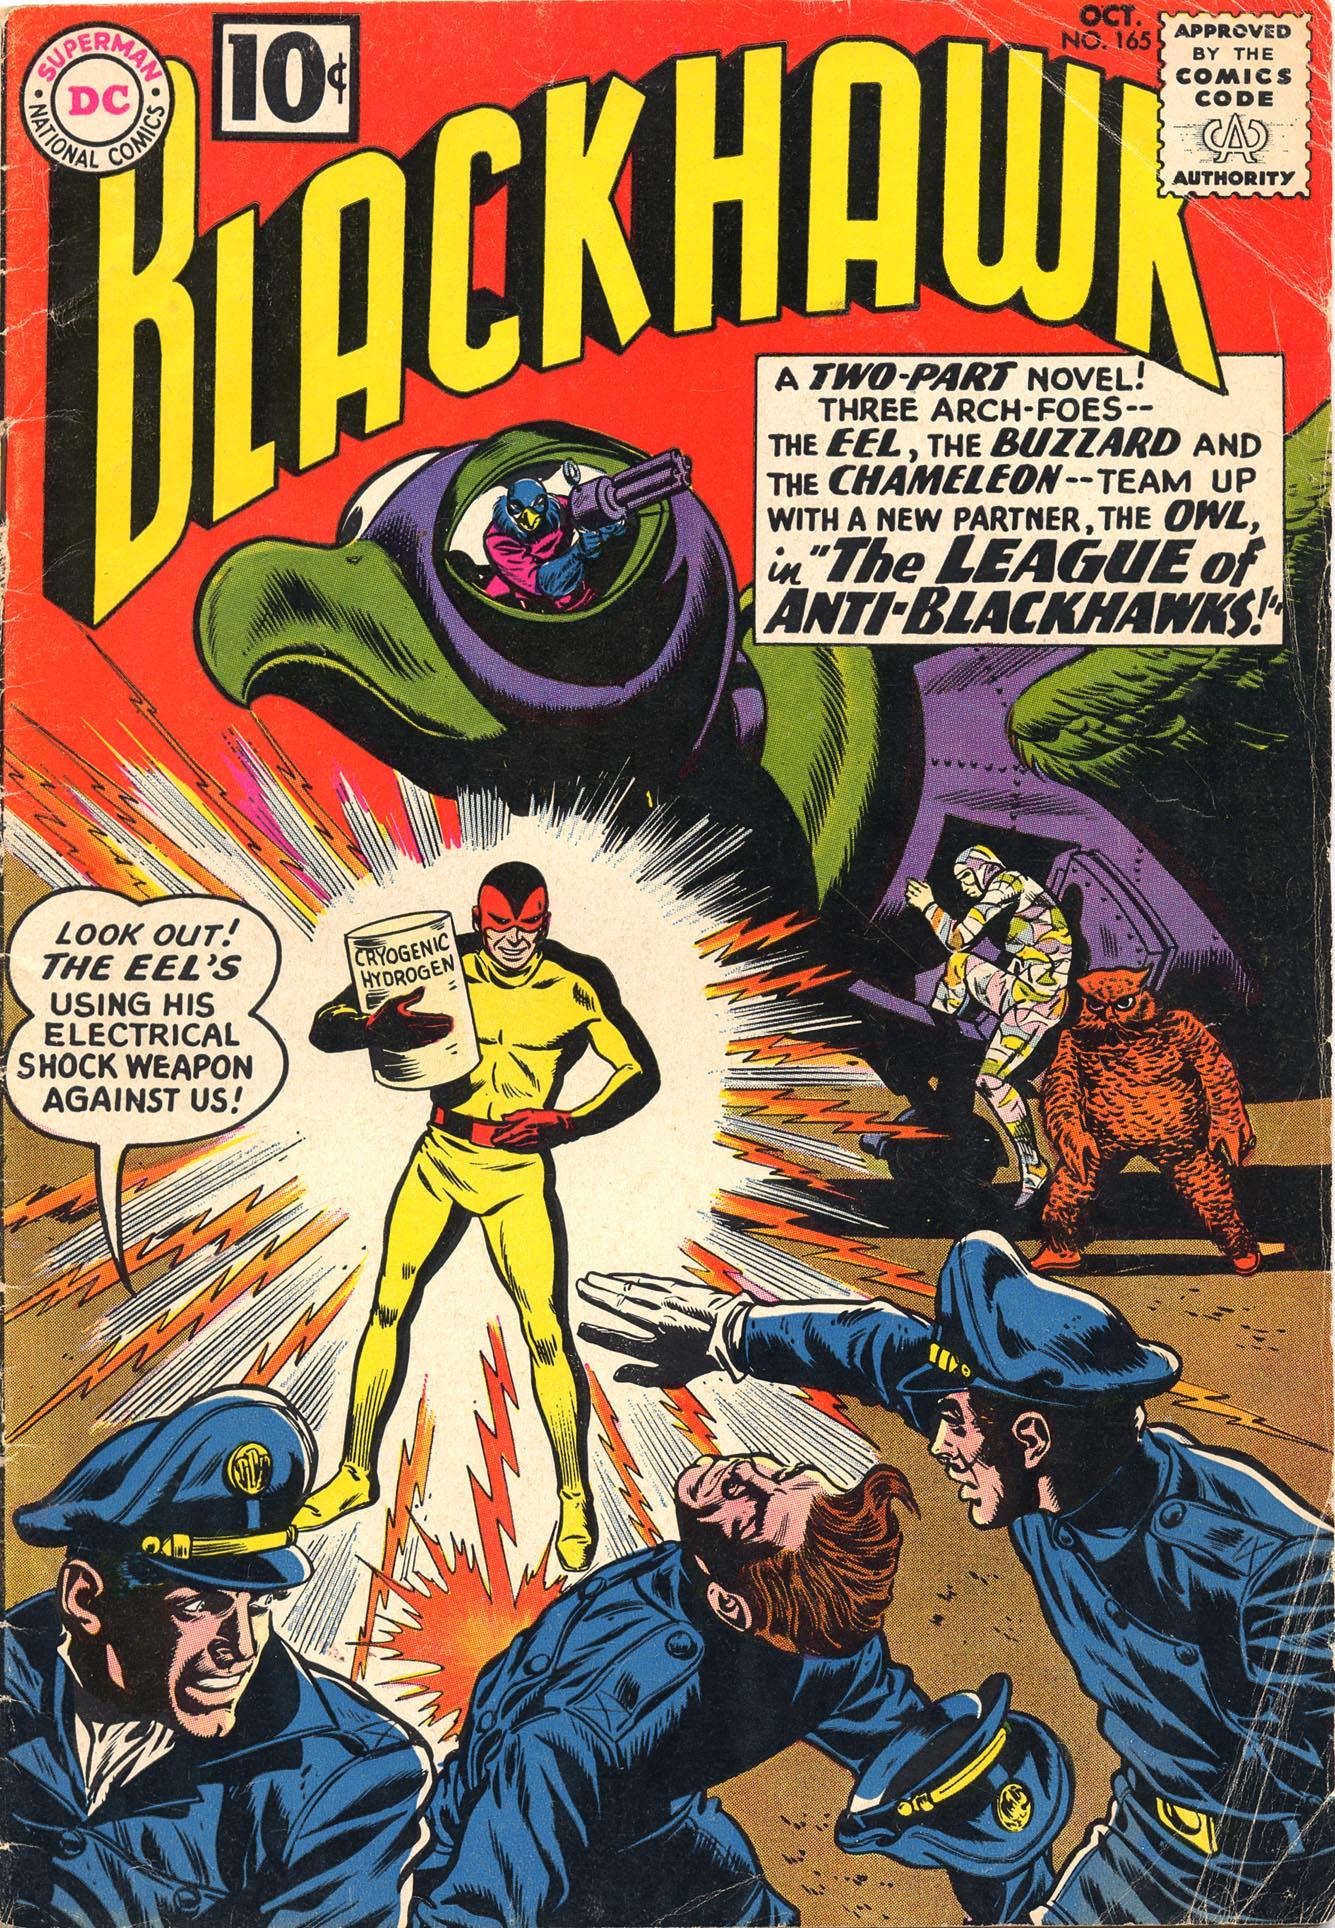 Blackhawk (1957) 165 Page 1